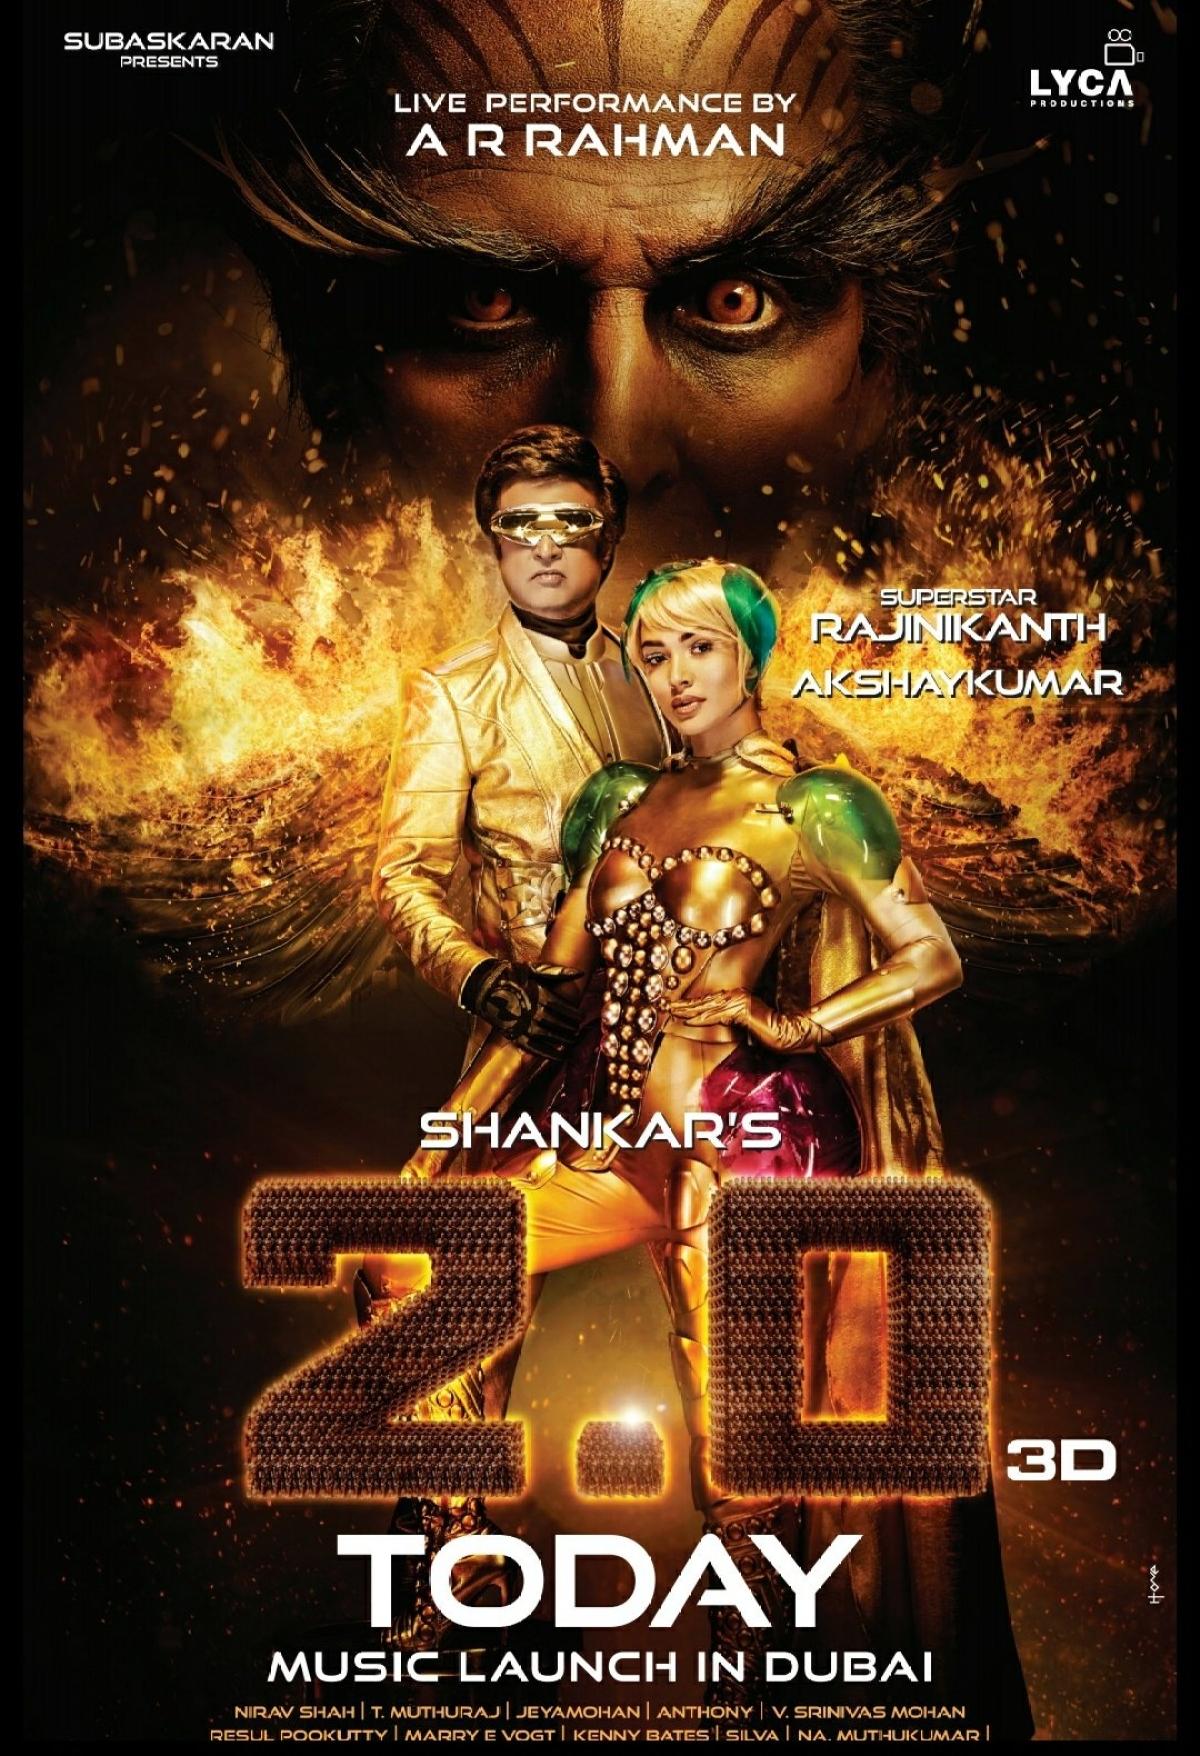 Rajinikanth, AR Rahman, Akshay Kumar Launch Music For \'2.0\' - The Quint